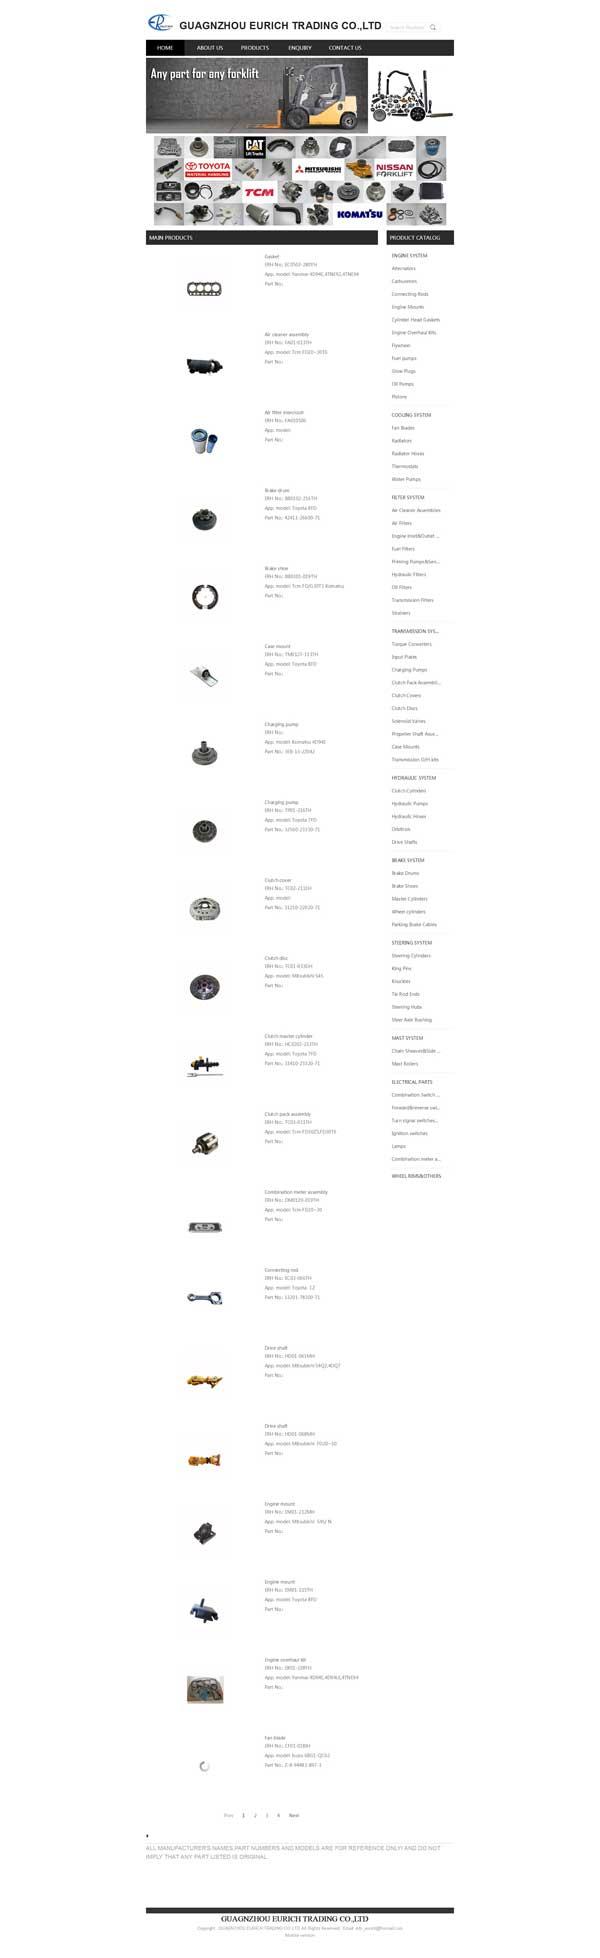 网站案例:GUAGNZHOU EURICH TRADING CO.,LTD